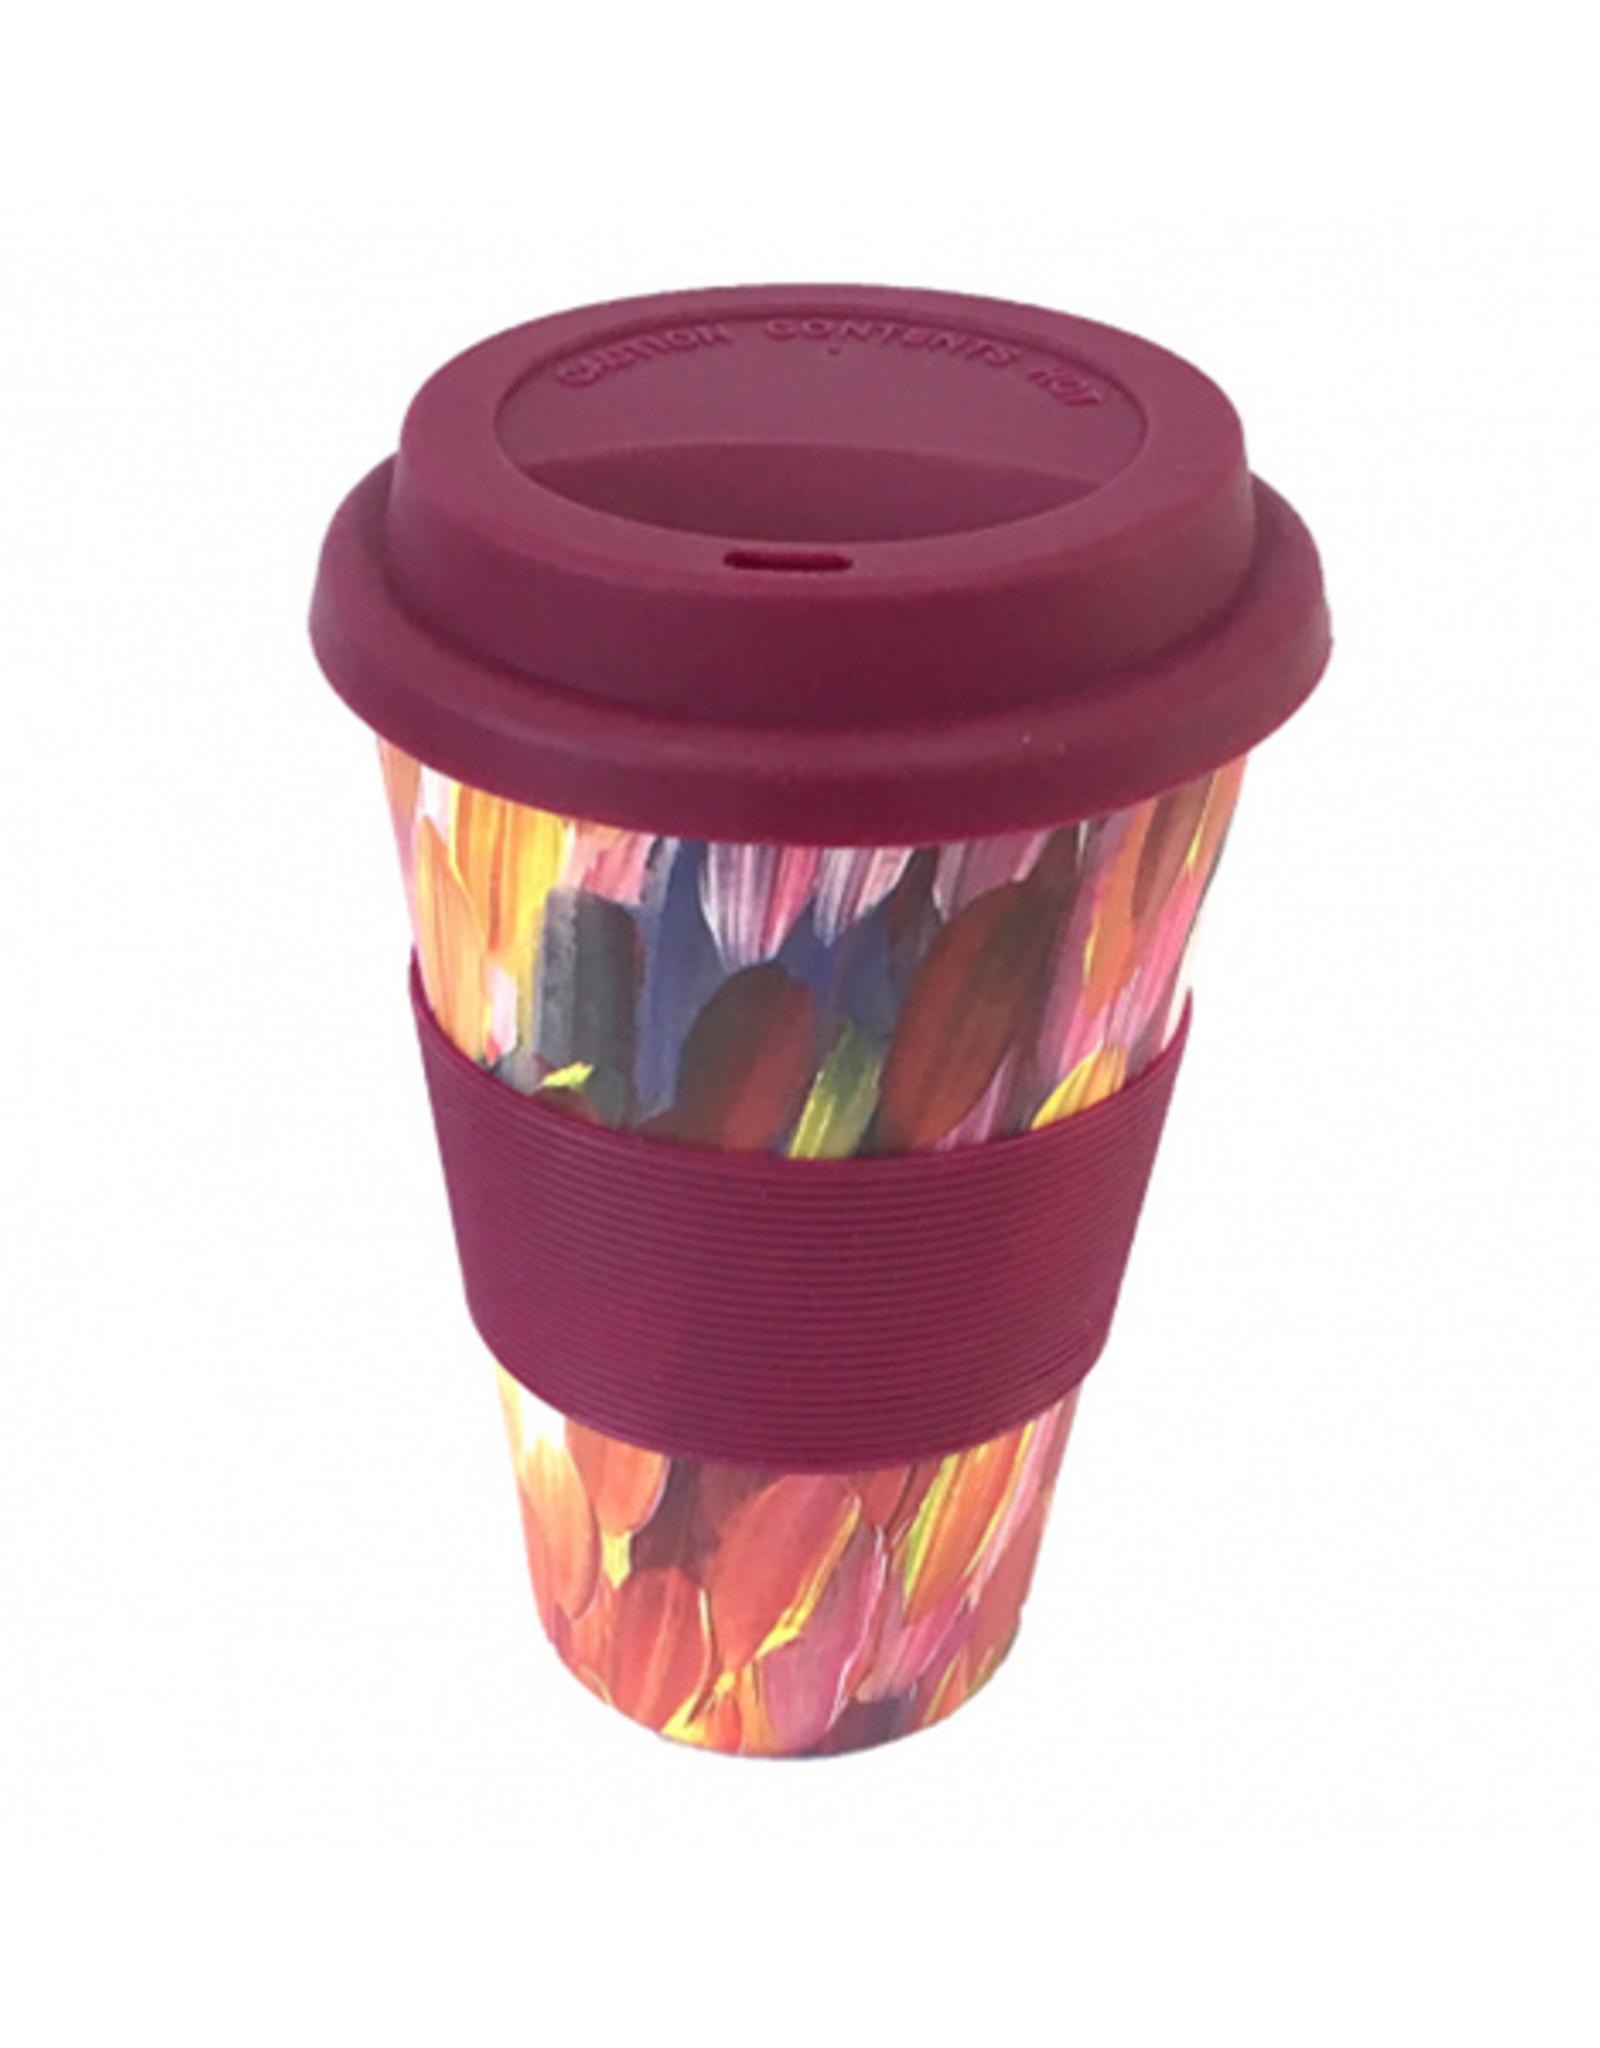 Utopia Bamboo Eco Coffee Cup 137 - Gloria Petyarre